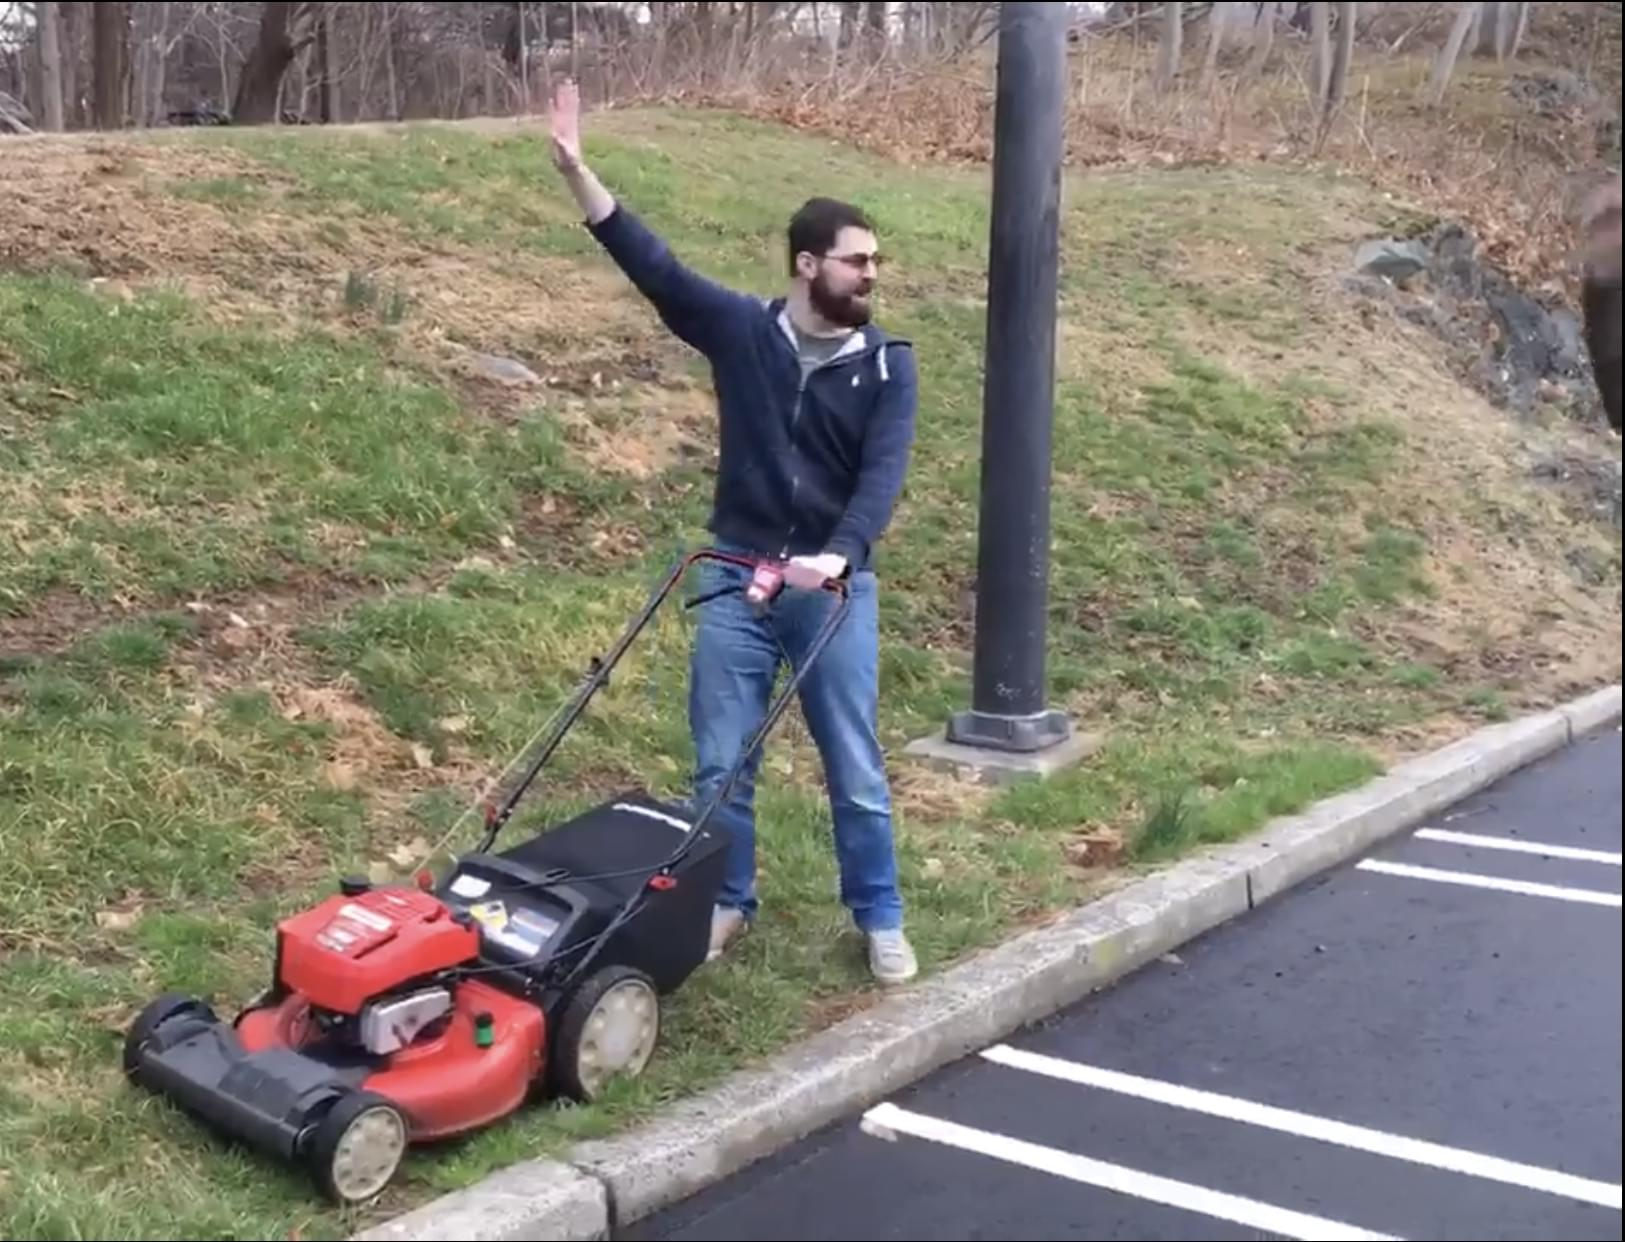 Wednesday, April 3: Phil Vs. The Lawn Mower – Round 2! Plus, AJ Takes On The Tribe